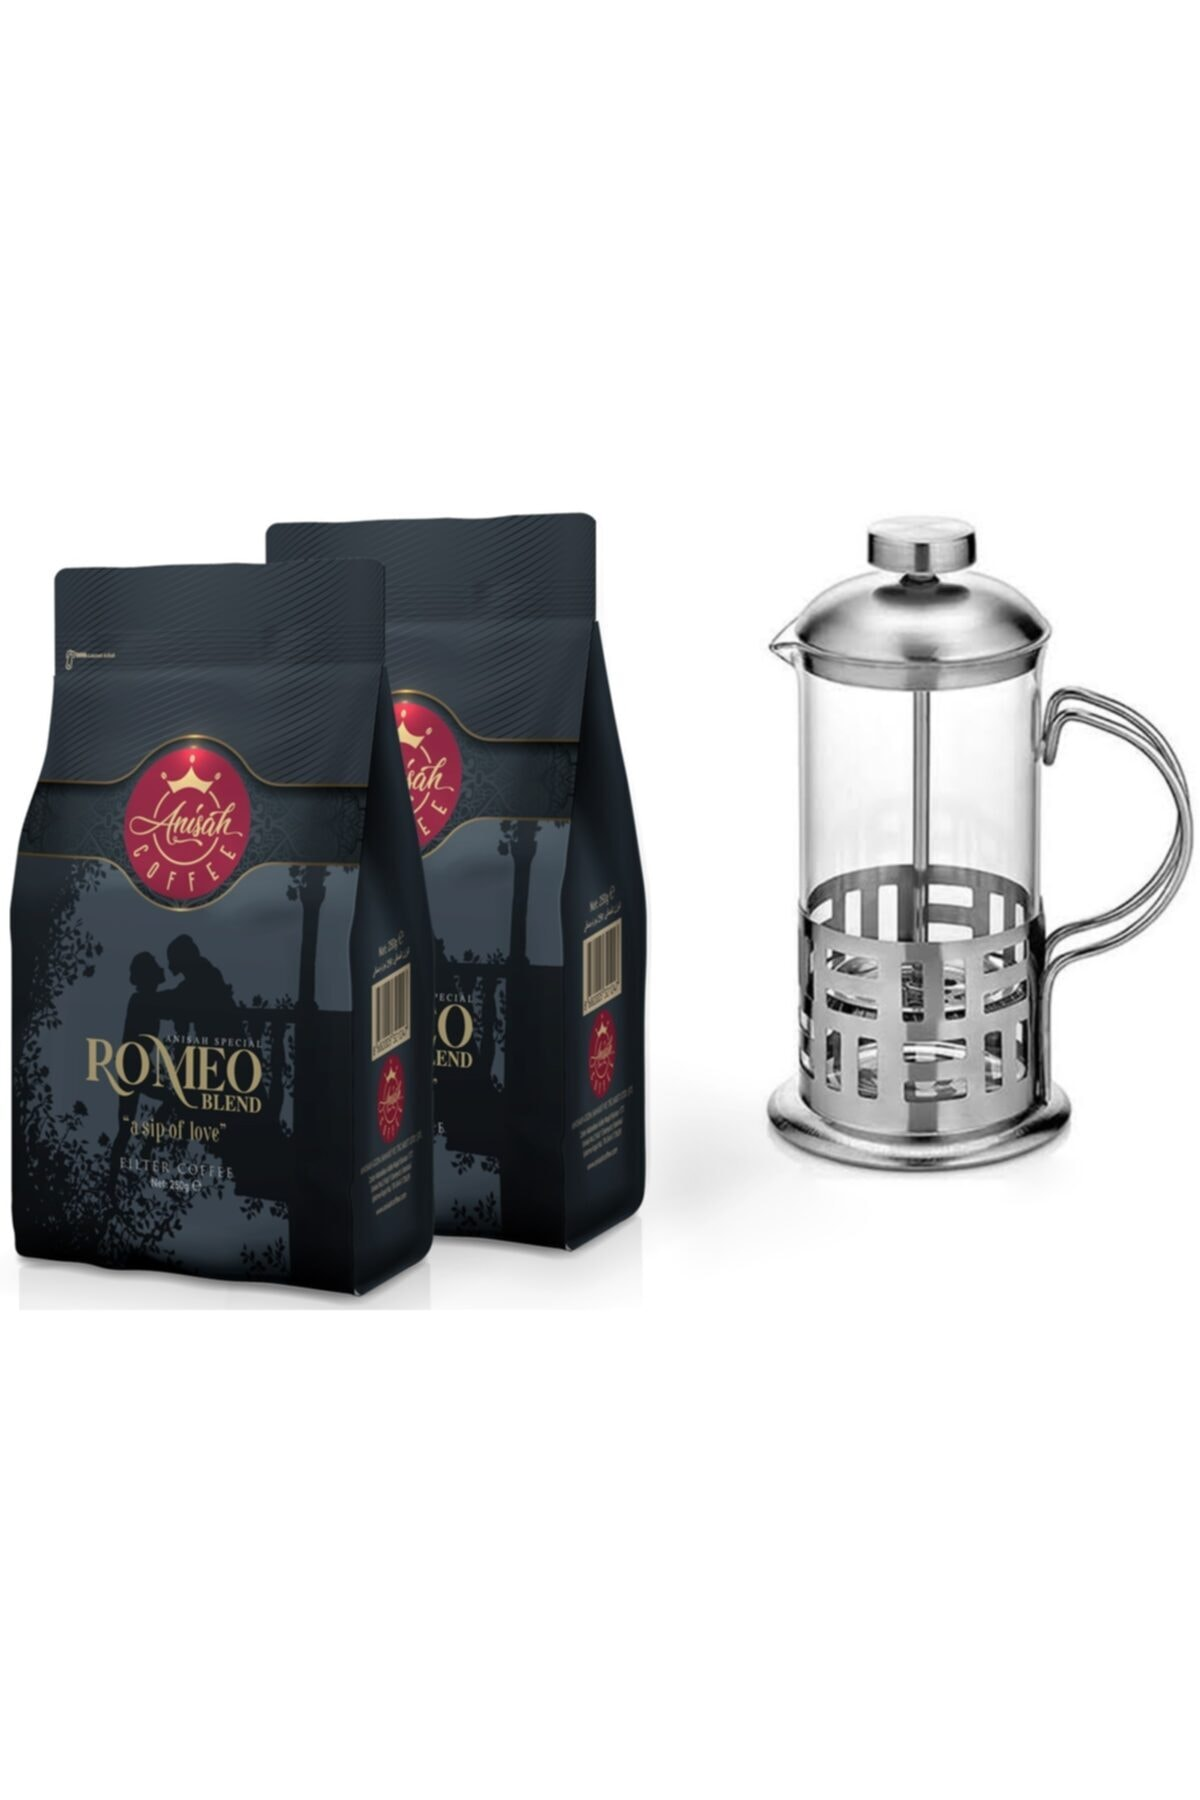 Filtre Kahve Romeo Blend Öğütülmüş - 350 ml French Press 2'li Paket (2*250 GR)